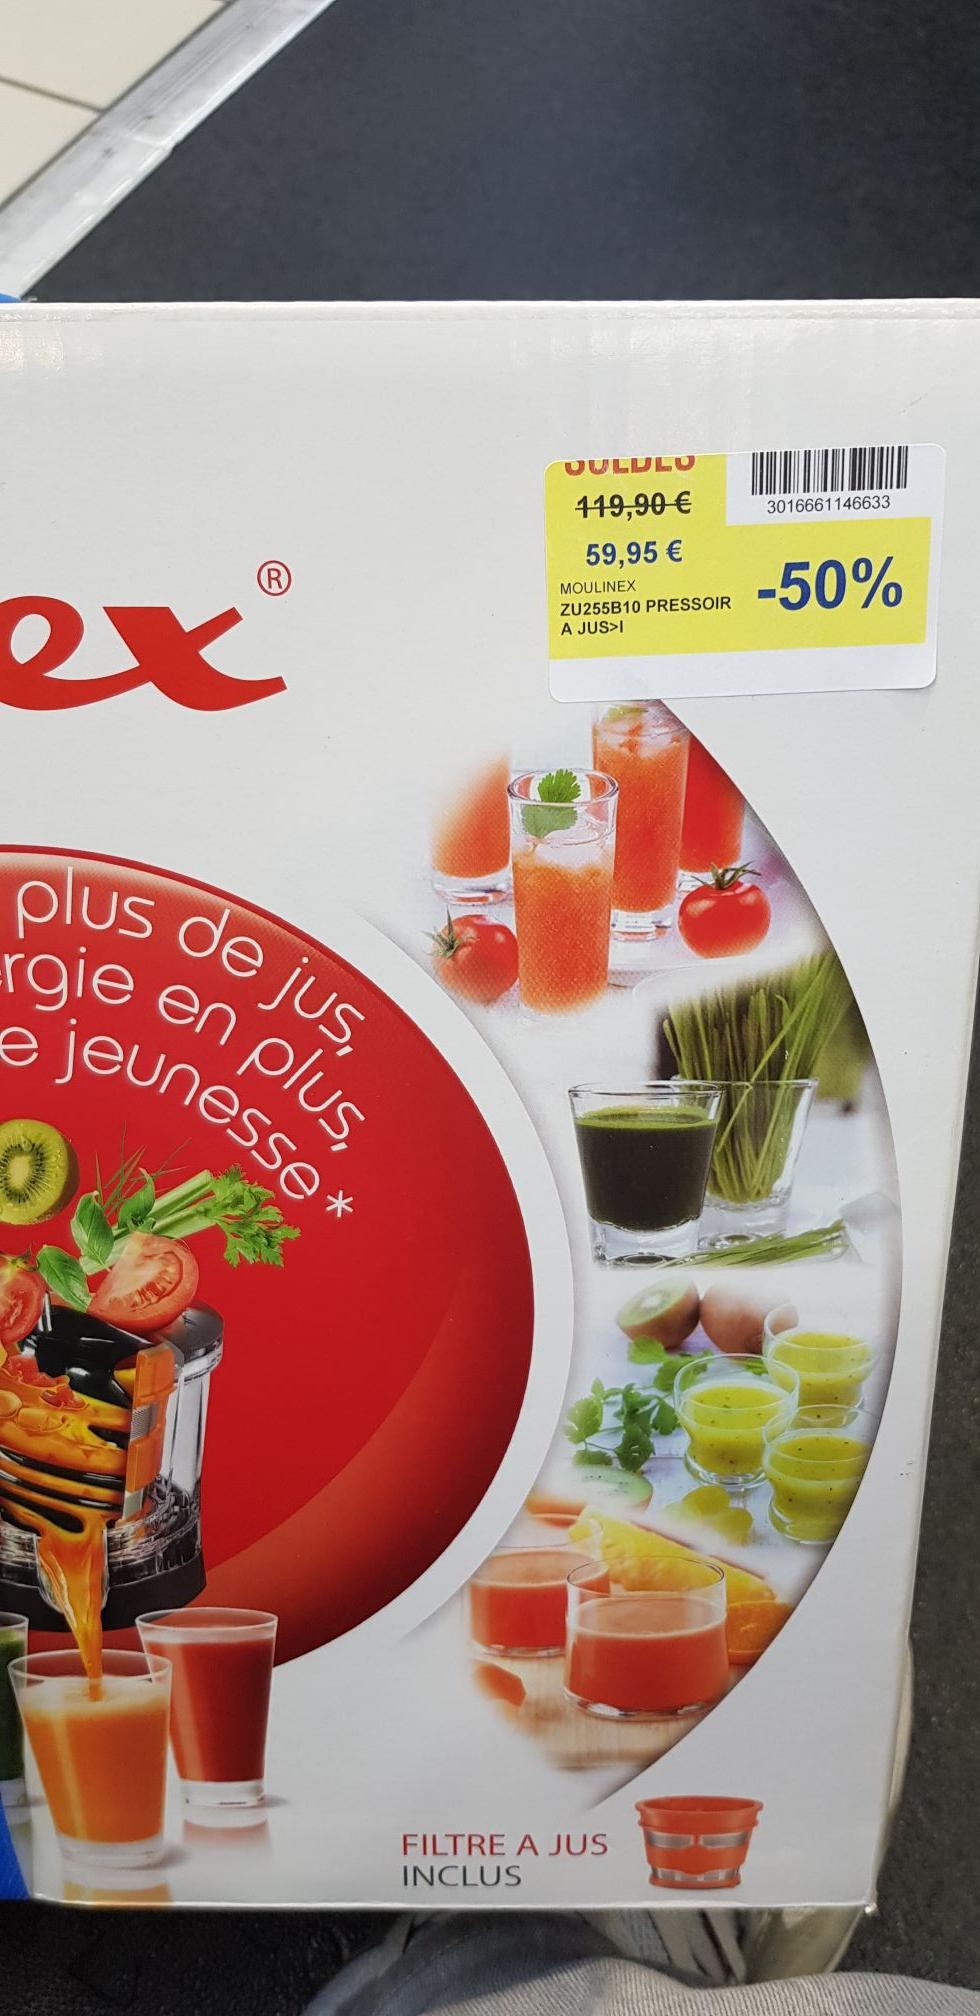 Extracteur de jus Moulinex Infiny Juice ZU255B10 - Ssaint-pierre-des-corps (37)